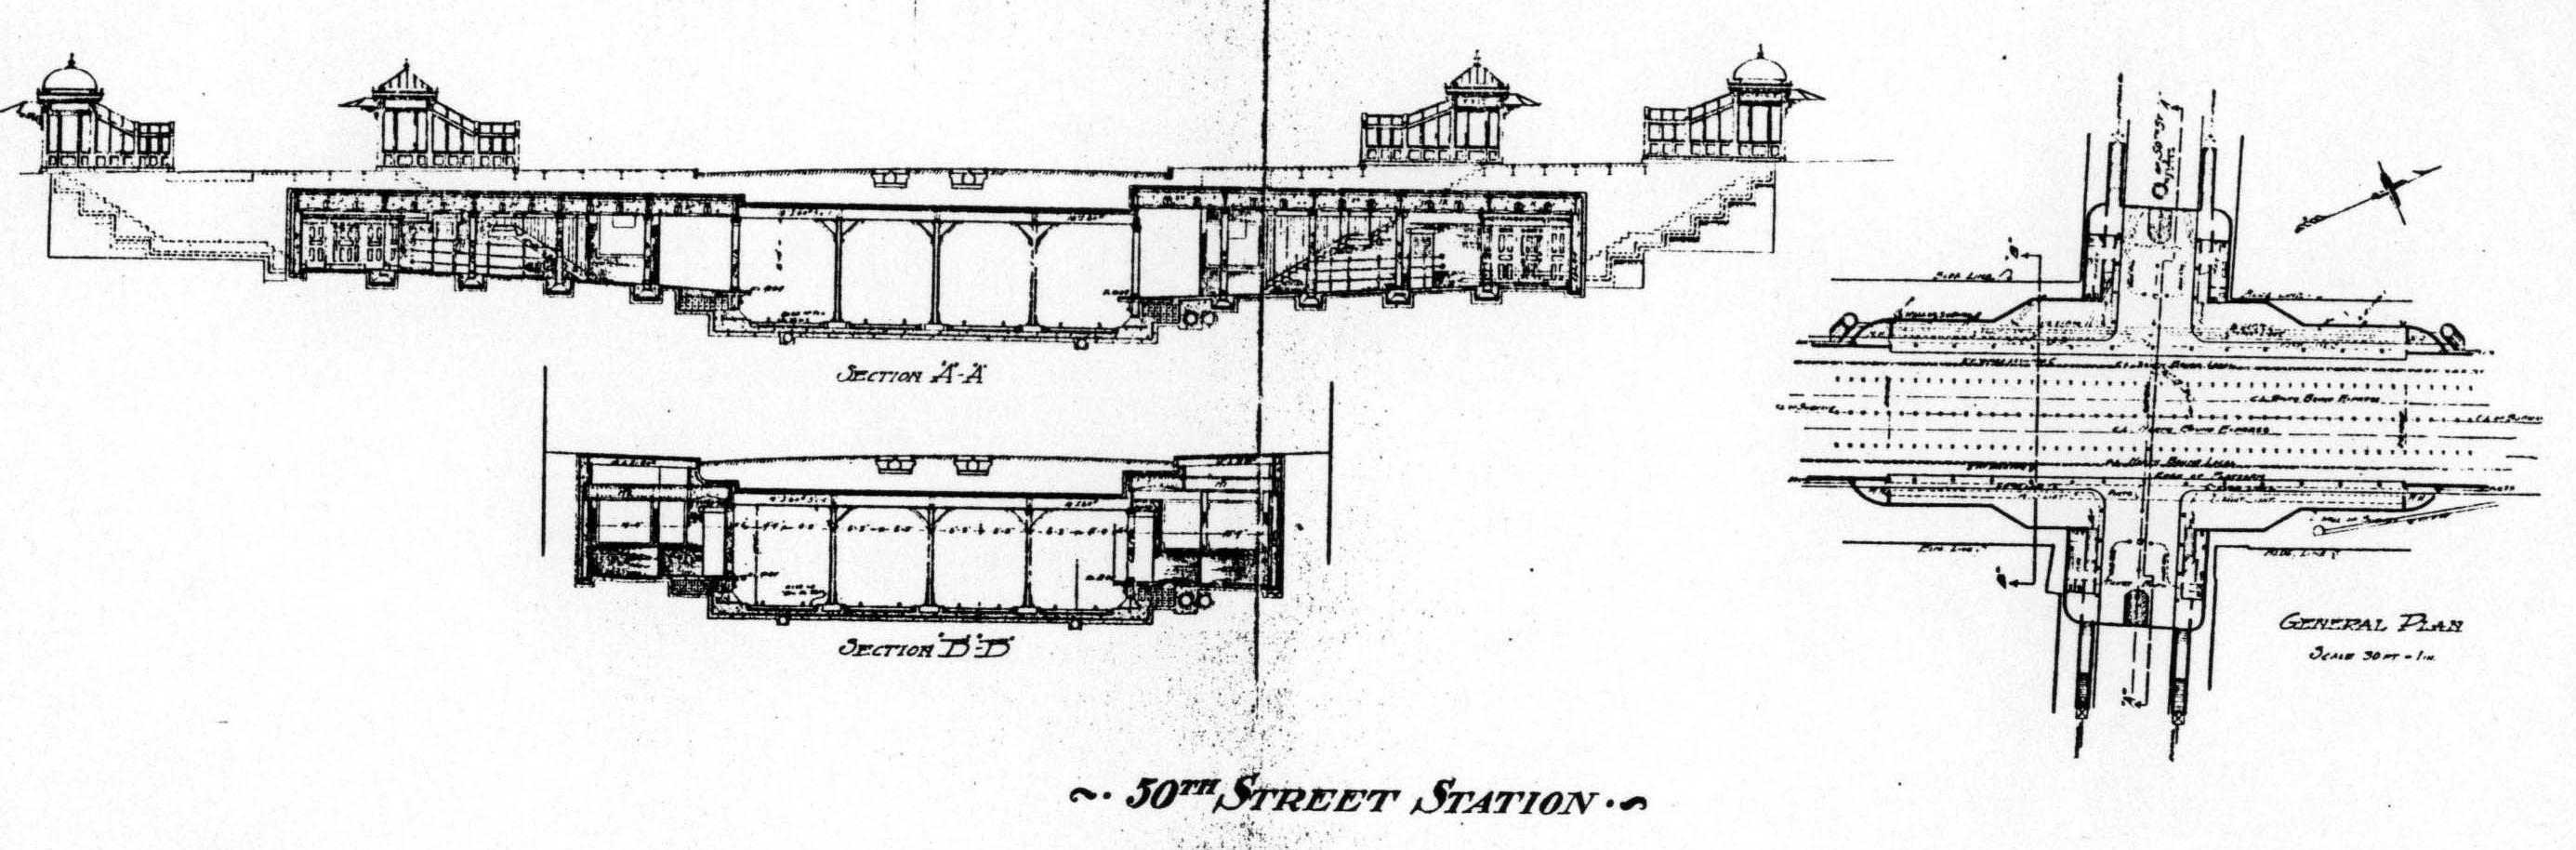 Diagram Th Station